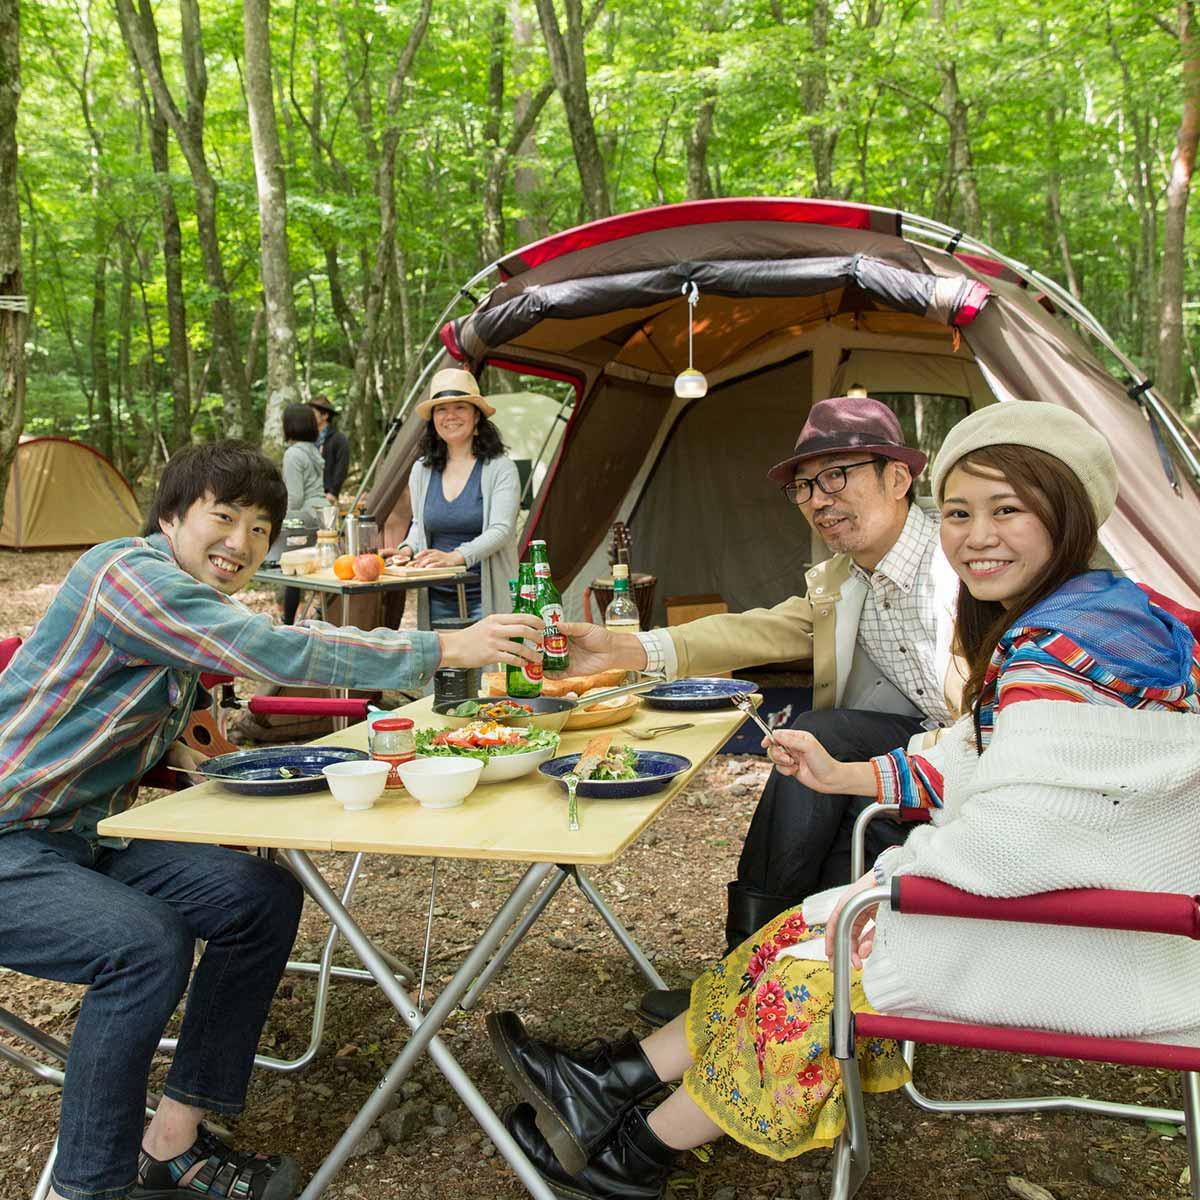 Campground (external link)